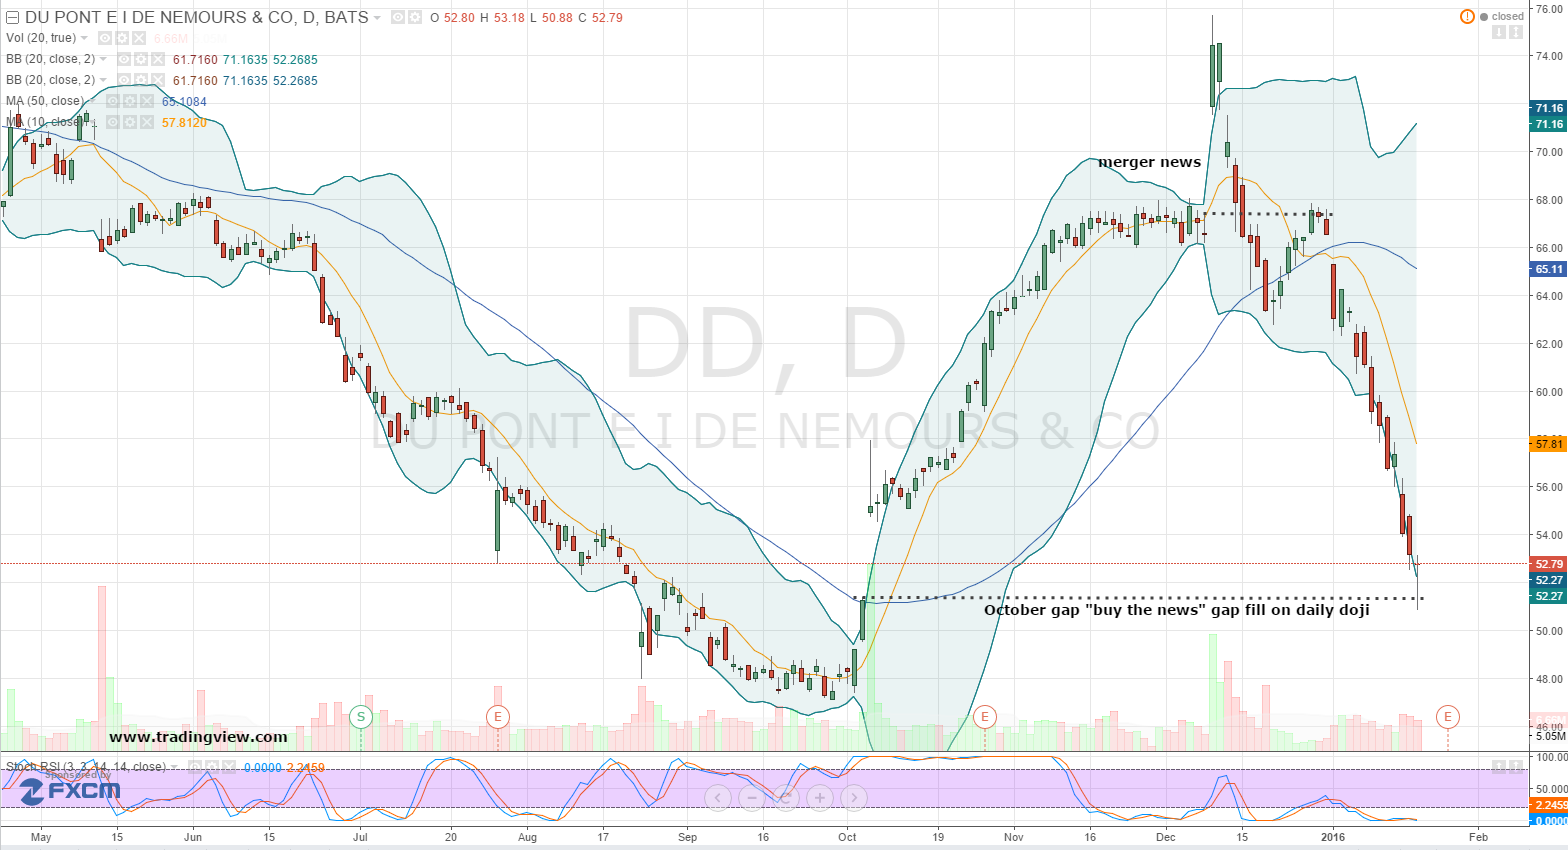 dd-daily-chart